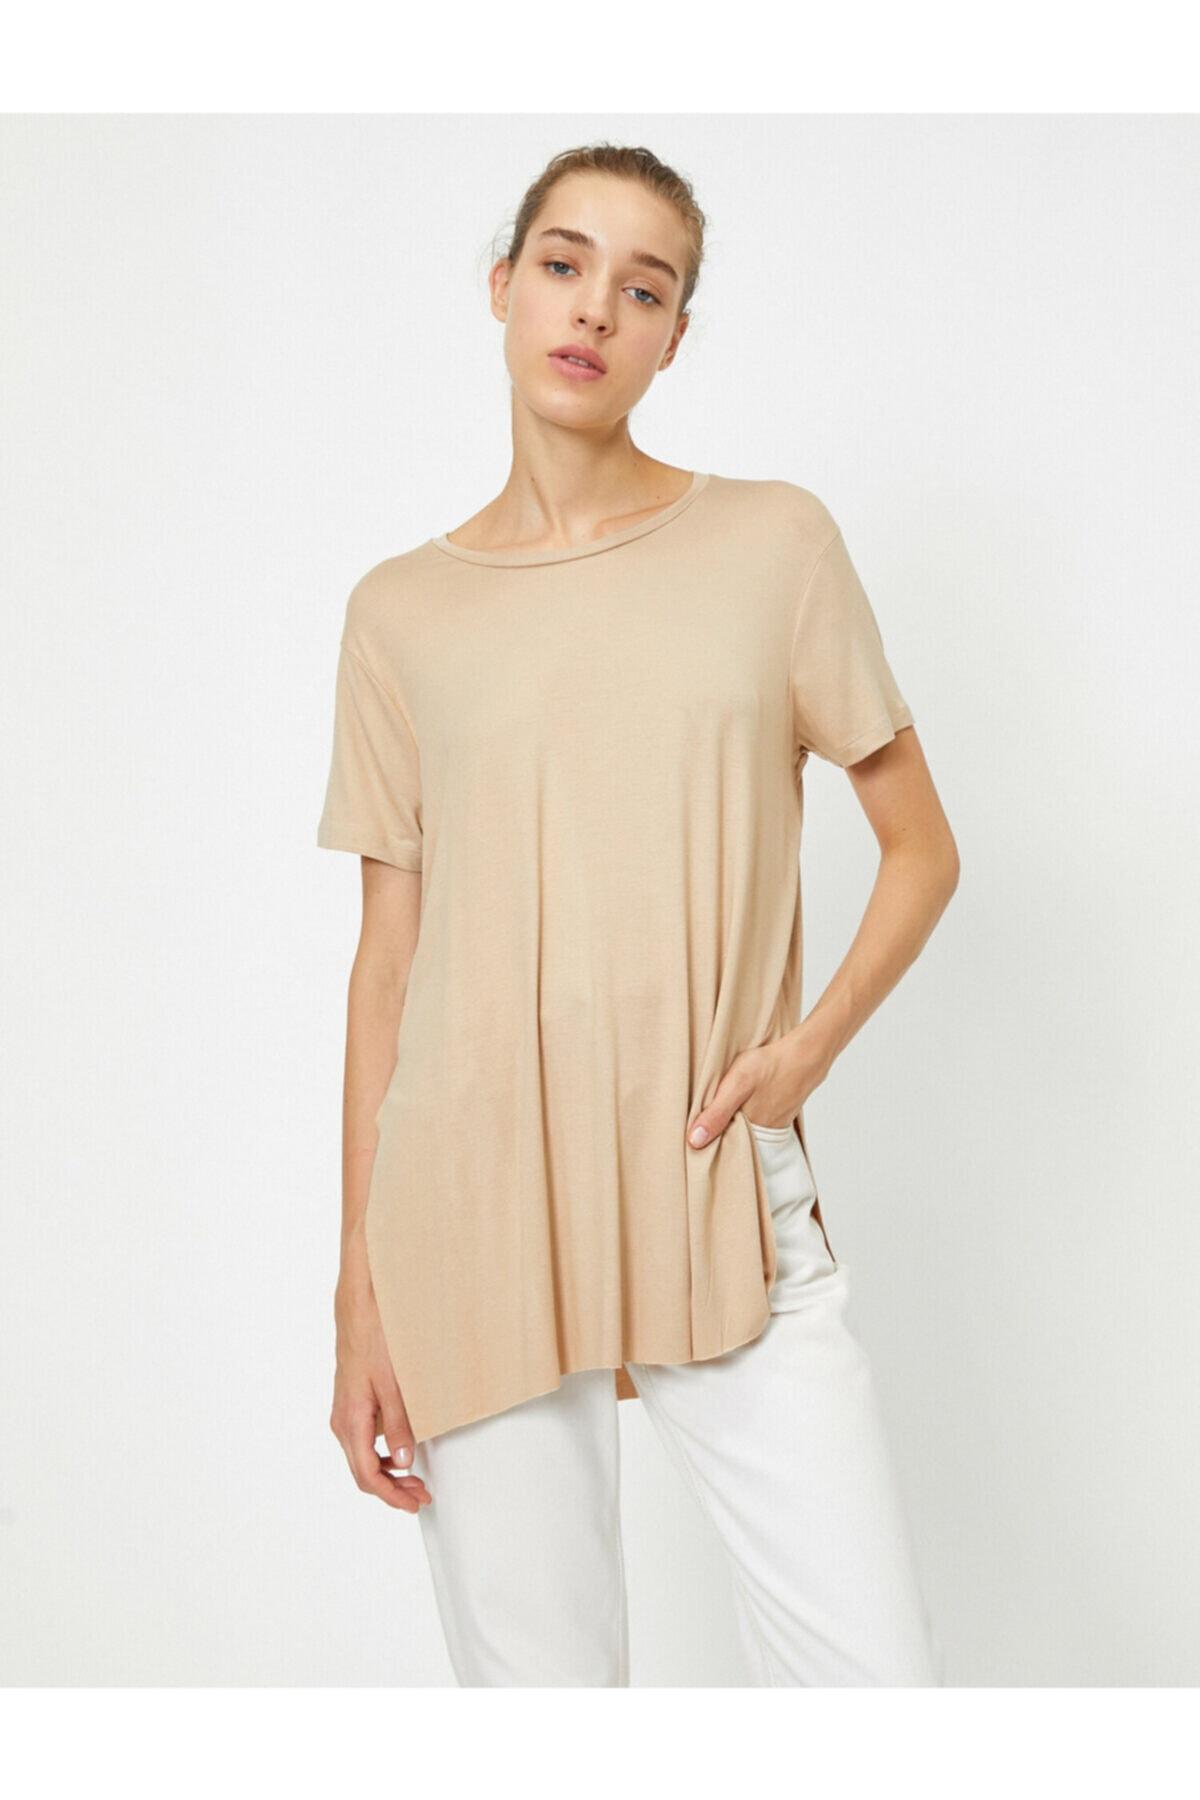 خرید اینترنتی تیشرت خاص برند کوتون رنگ قهوه ای کد ty48177913